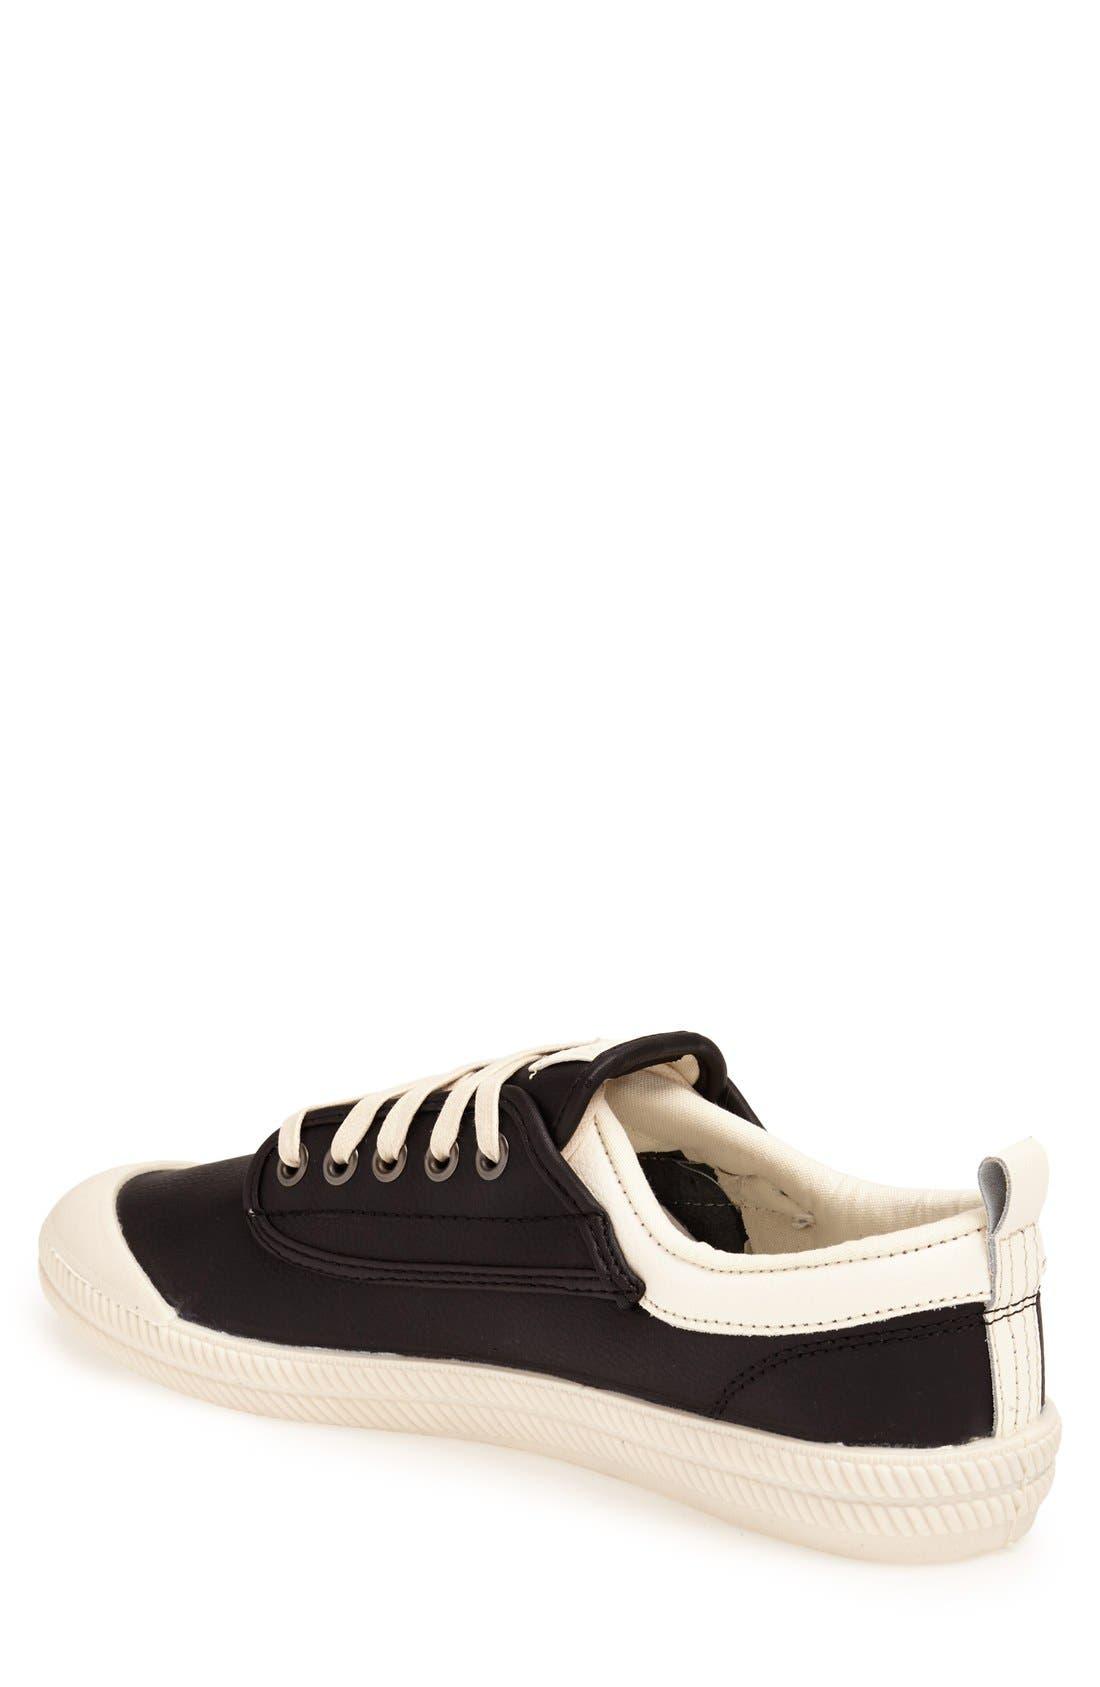 'International' Leather Sneaker,                             Alternate thumbnail 3, color,                             015